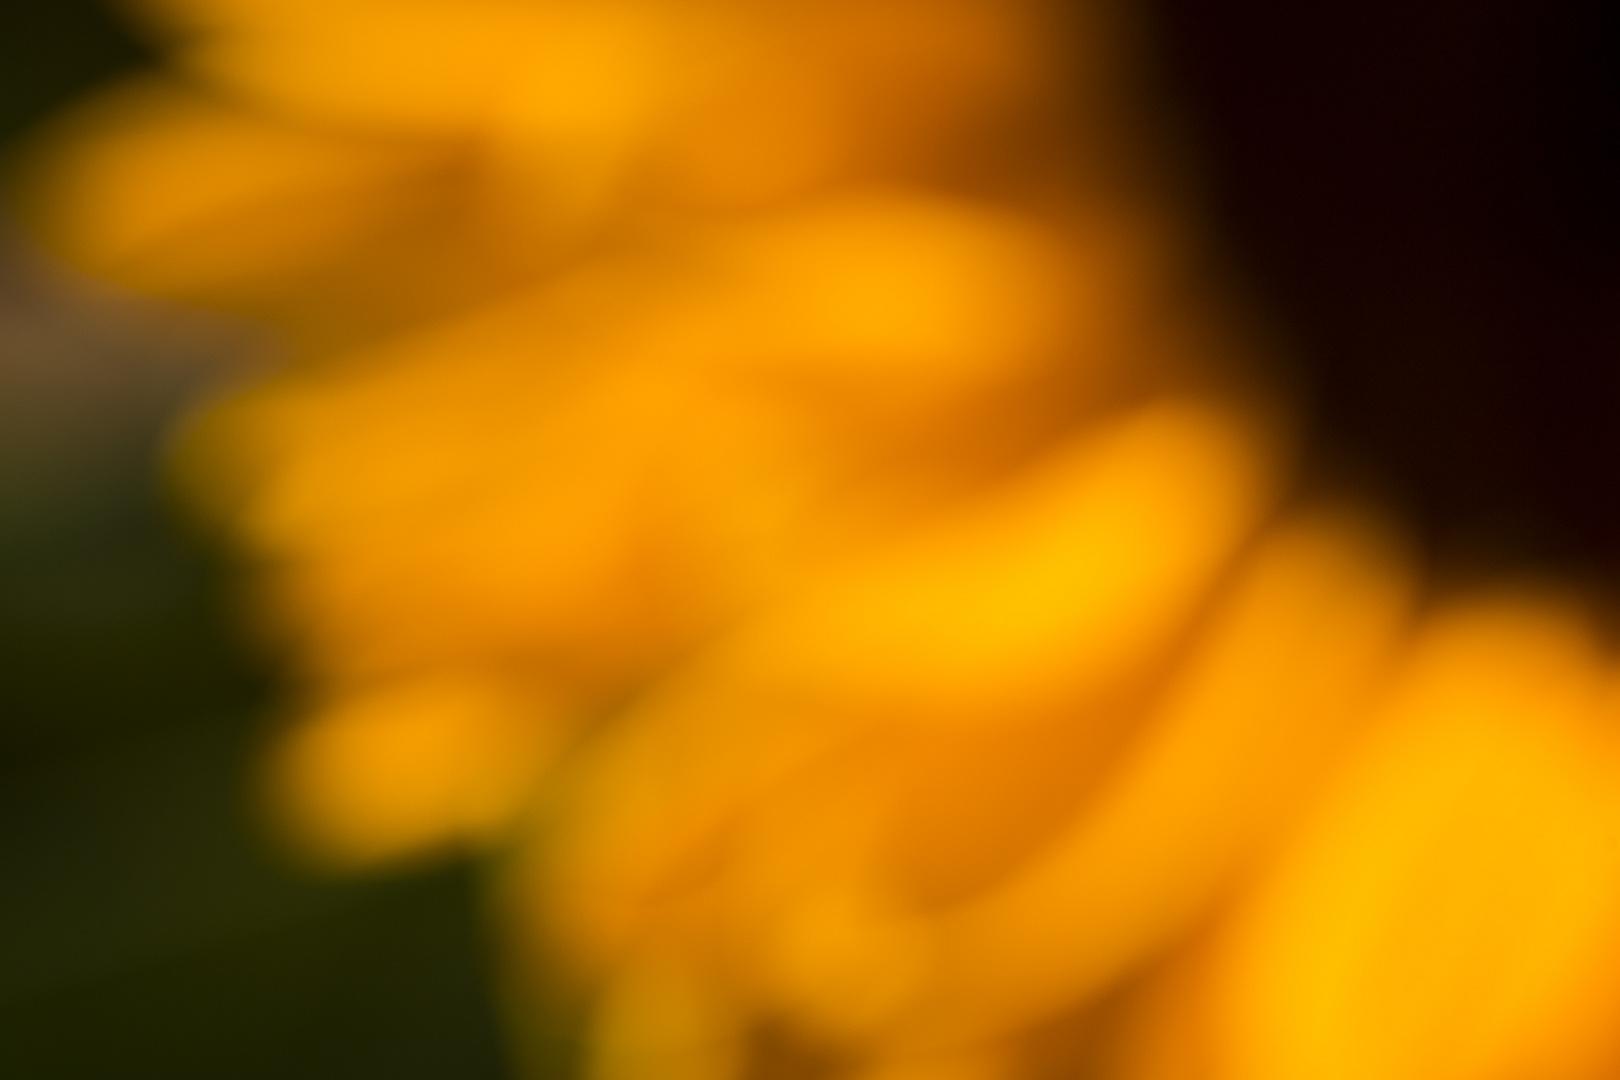 Sonnenblume_Herbst_Tabletop